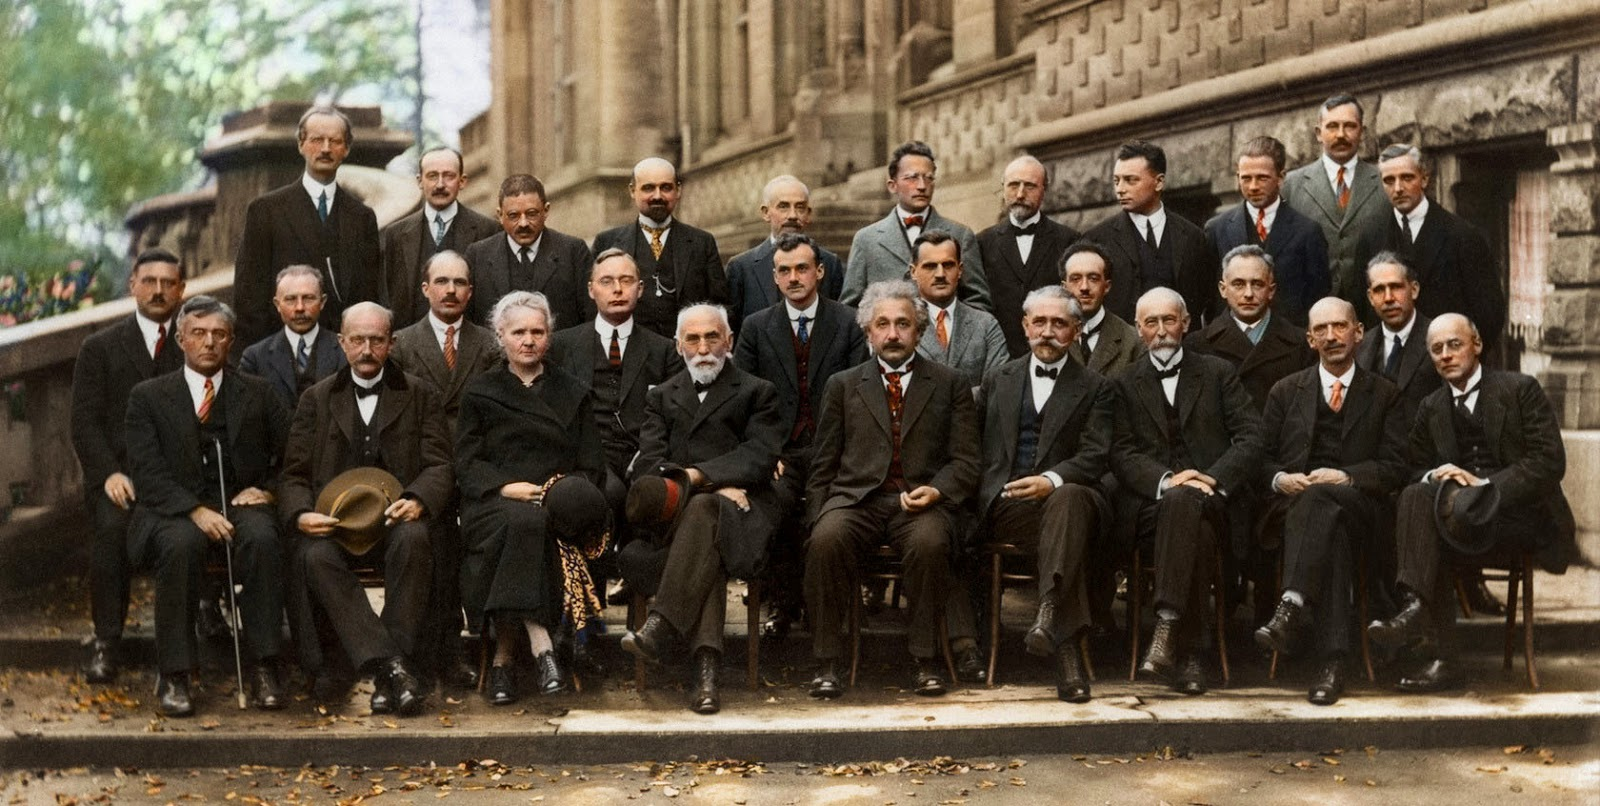 sursa imaginii: rarehistoricalphotos.com/solvay-conference-probably- intelligent-picture-ever-taken-1927/